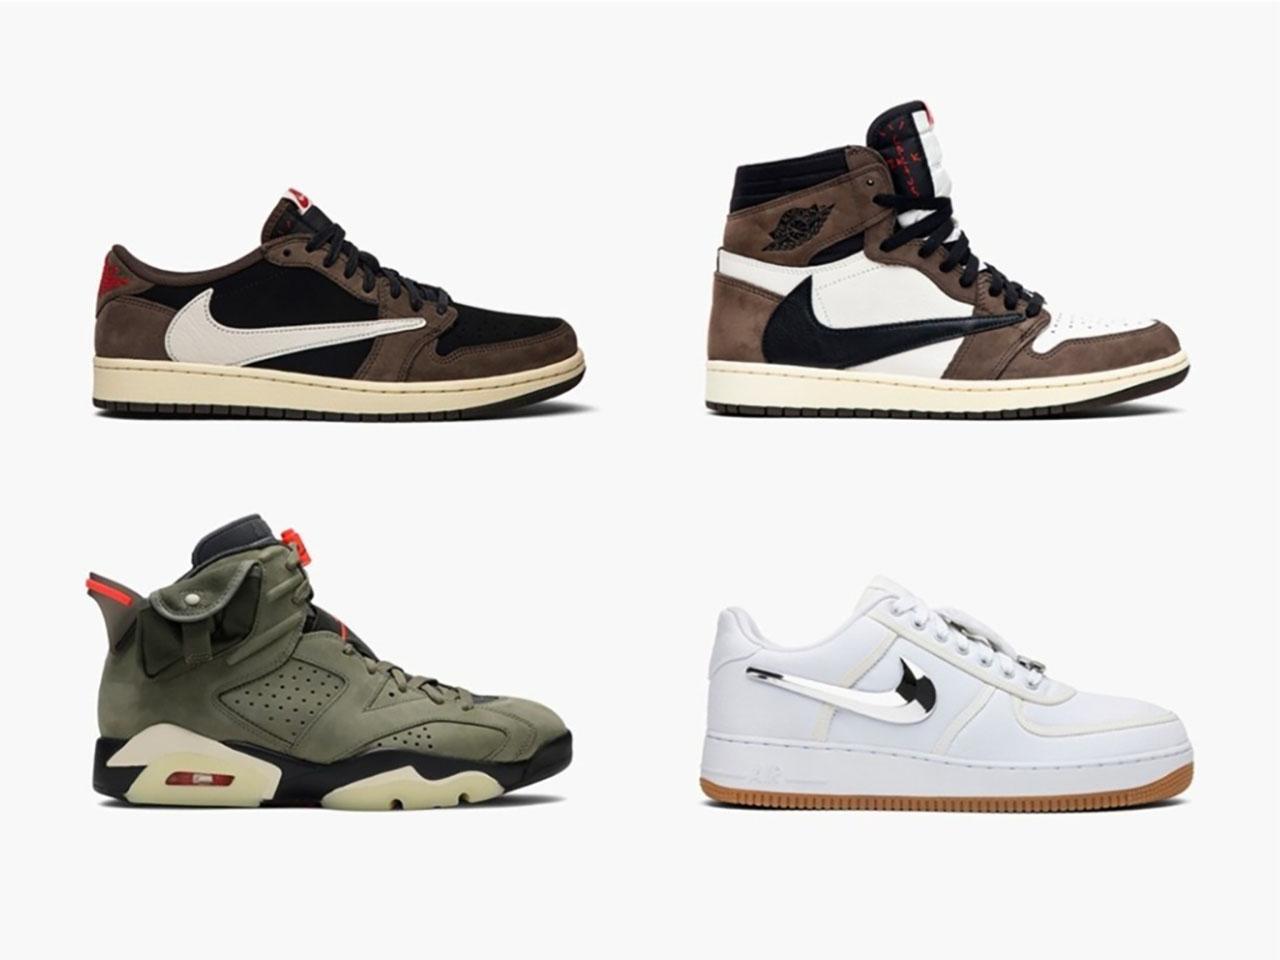 11 sneakers του Τράβις Σκοτ που εξαφανίστηκαν αμέσως από τα ράφια